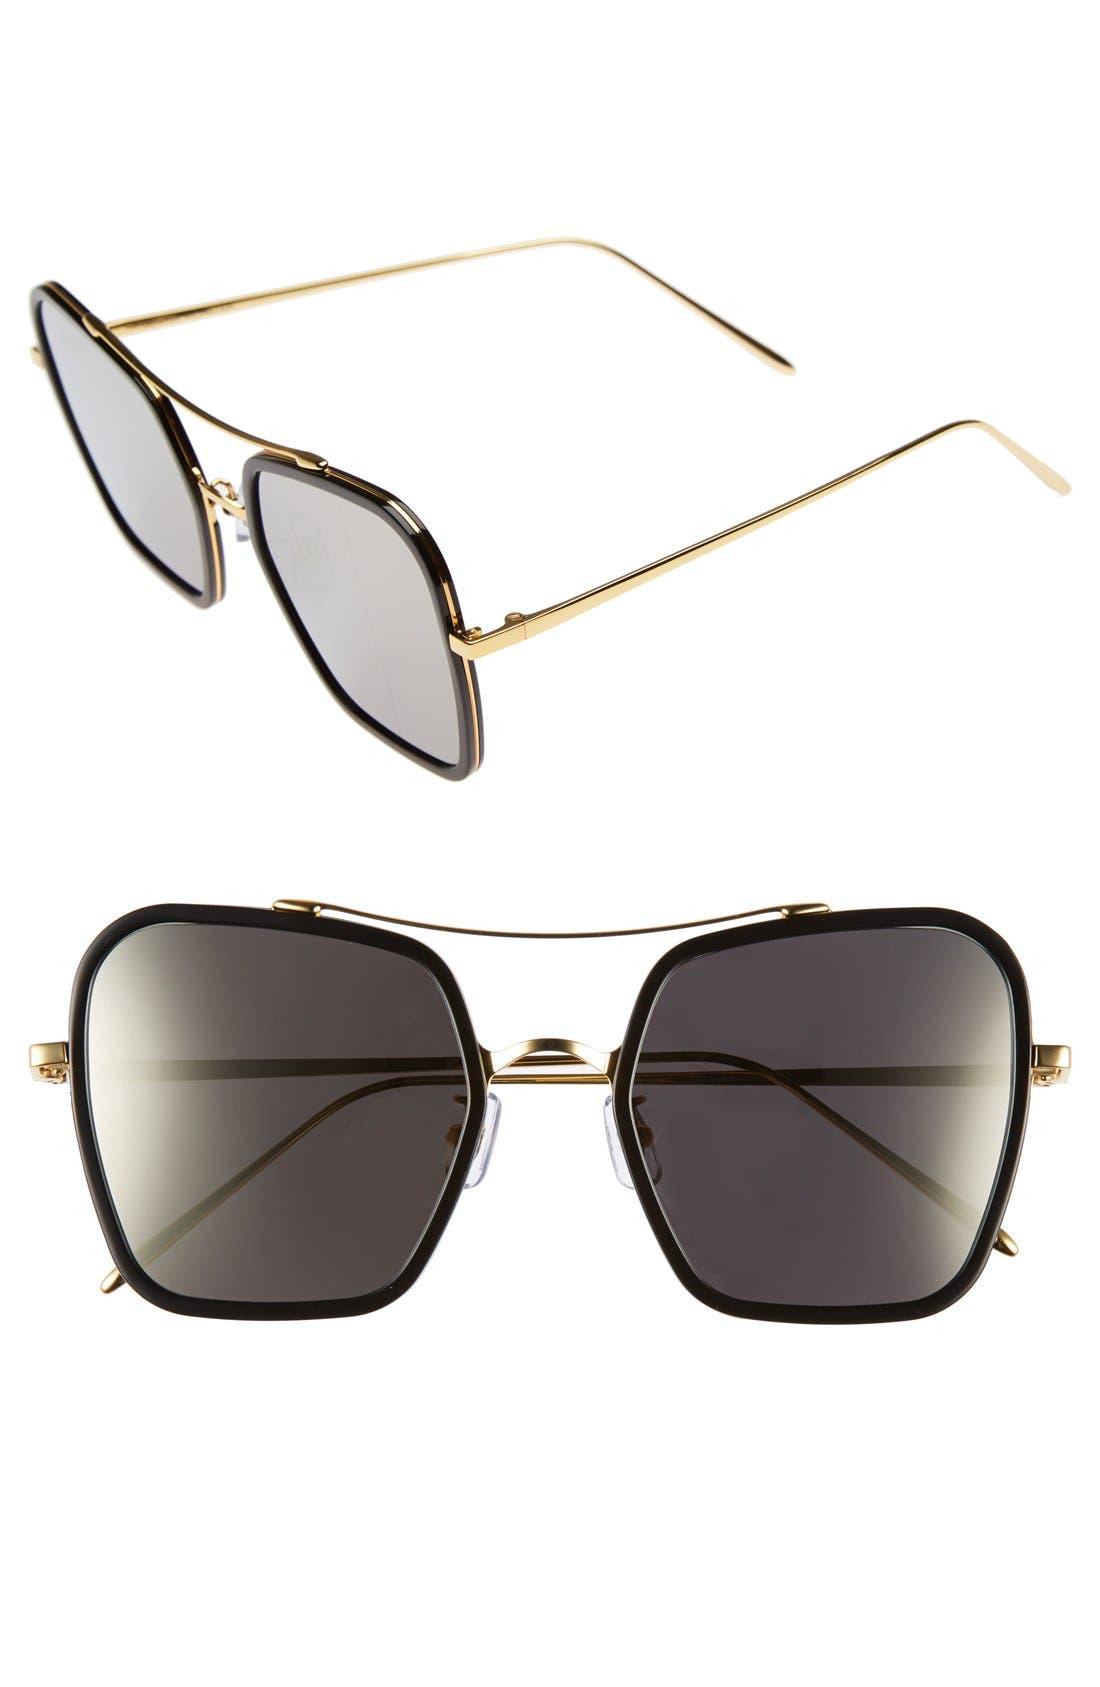 53mm Retro Square Sunglasses,                             Main thumbnail 2, color,